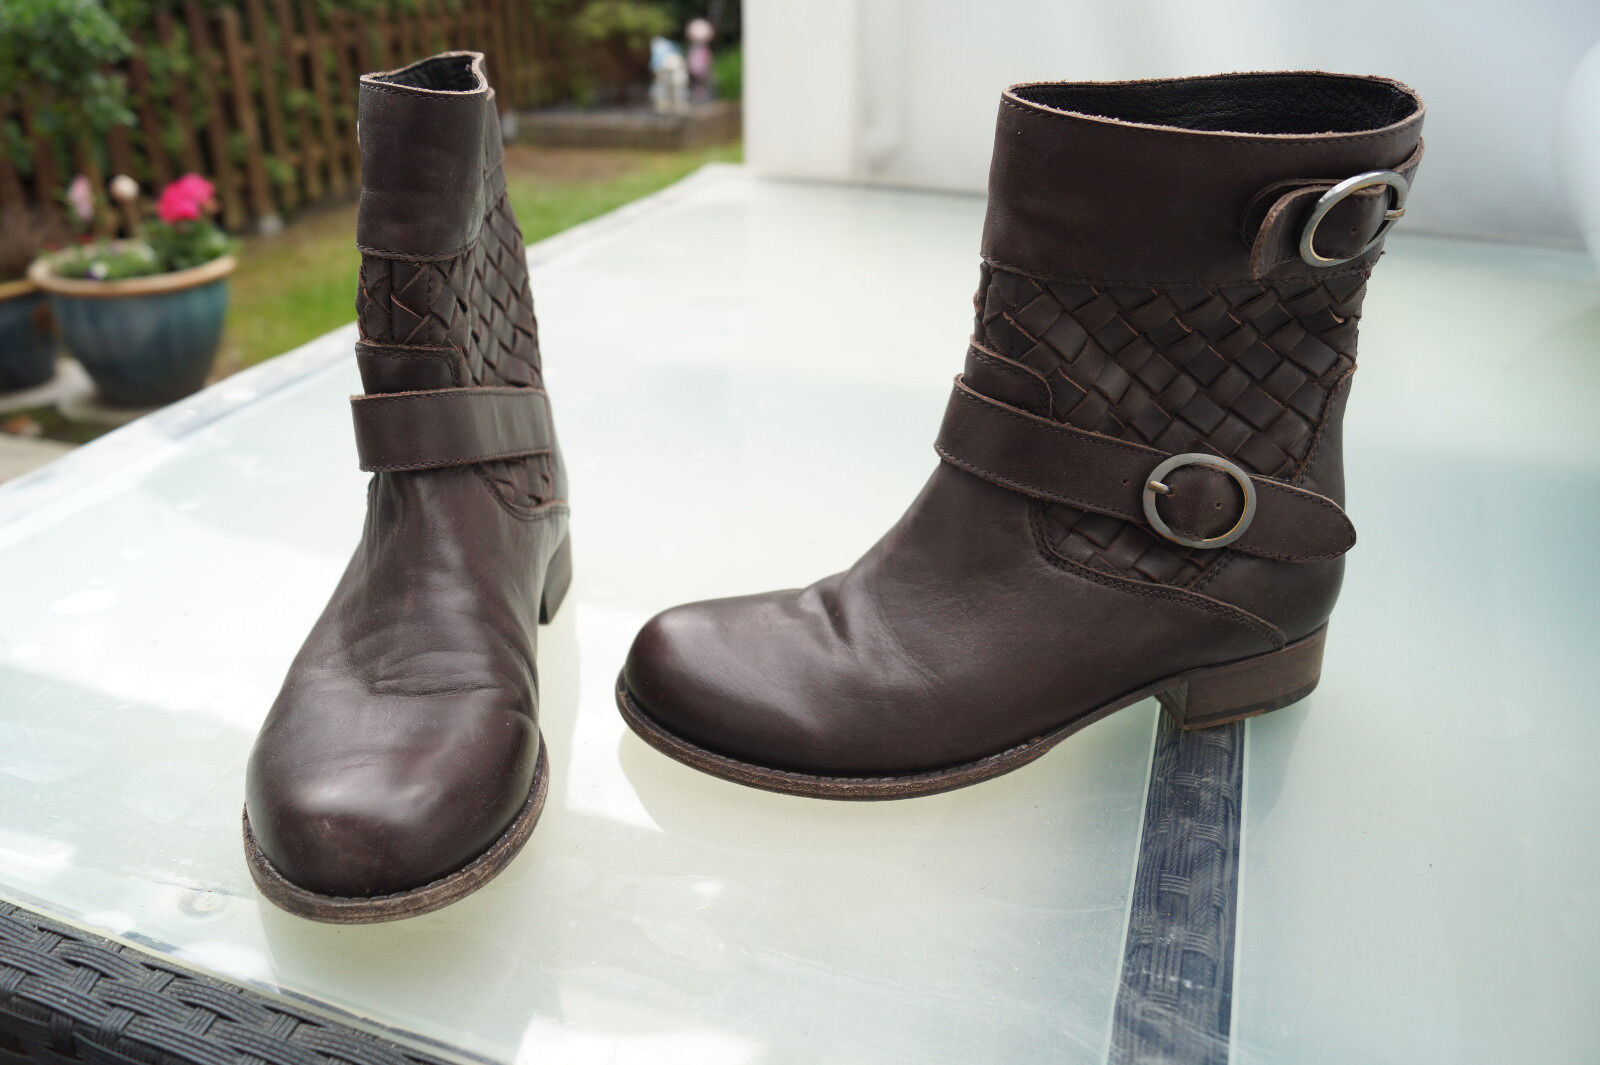 Liebeskind Femmes Chaussures Boots Bottes Bottines Taille 37 Marron Doux Doux Doux Cuir Top 4267f0